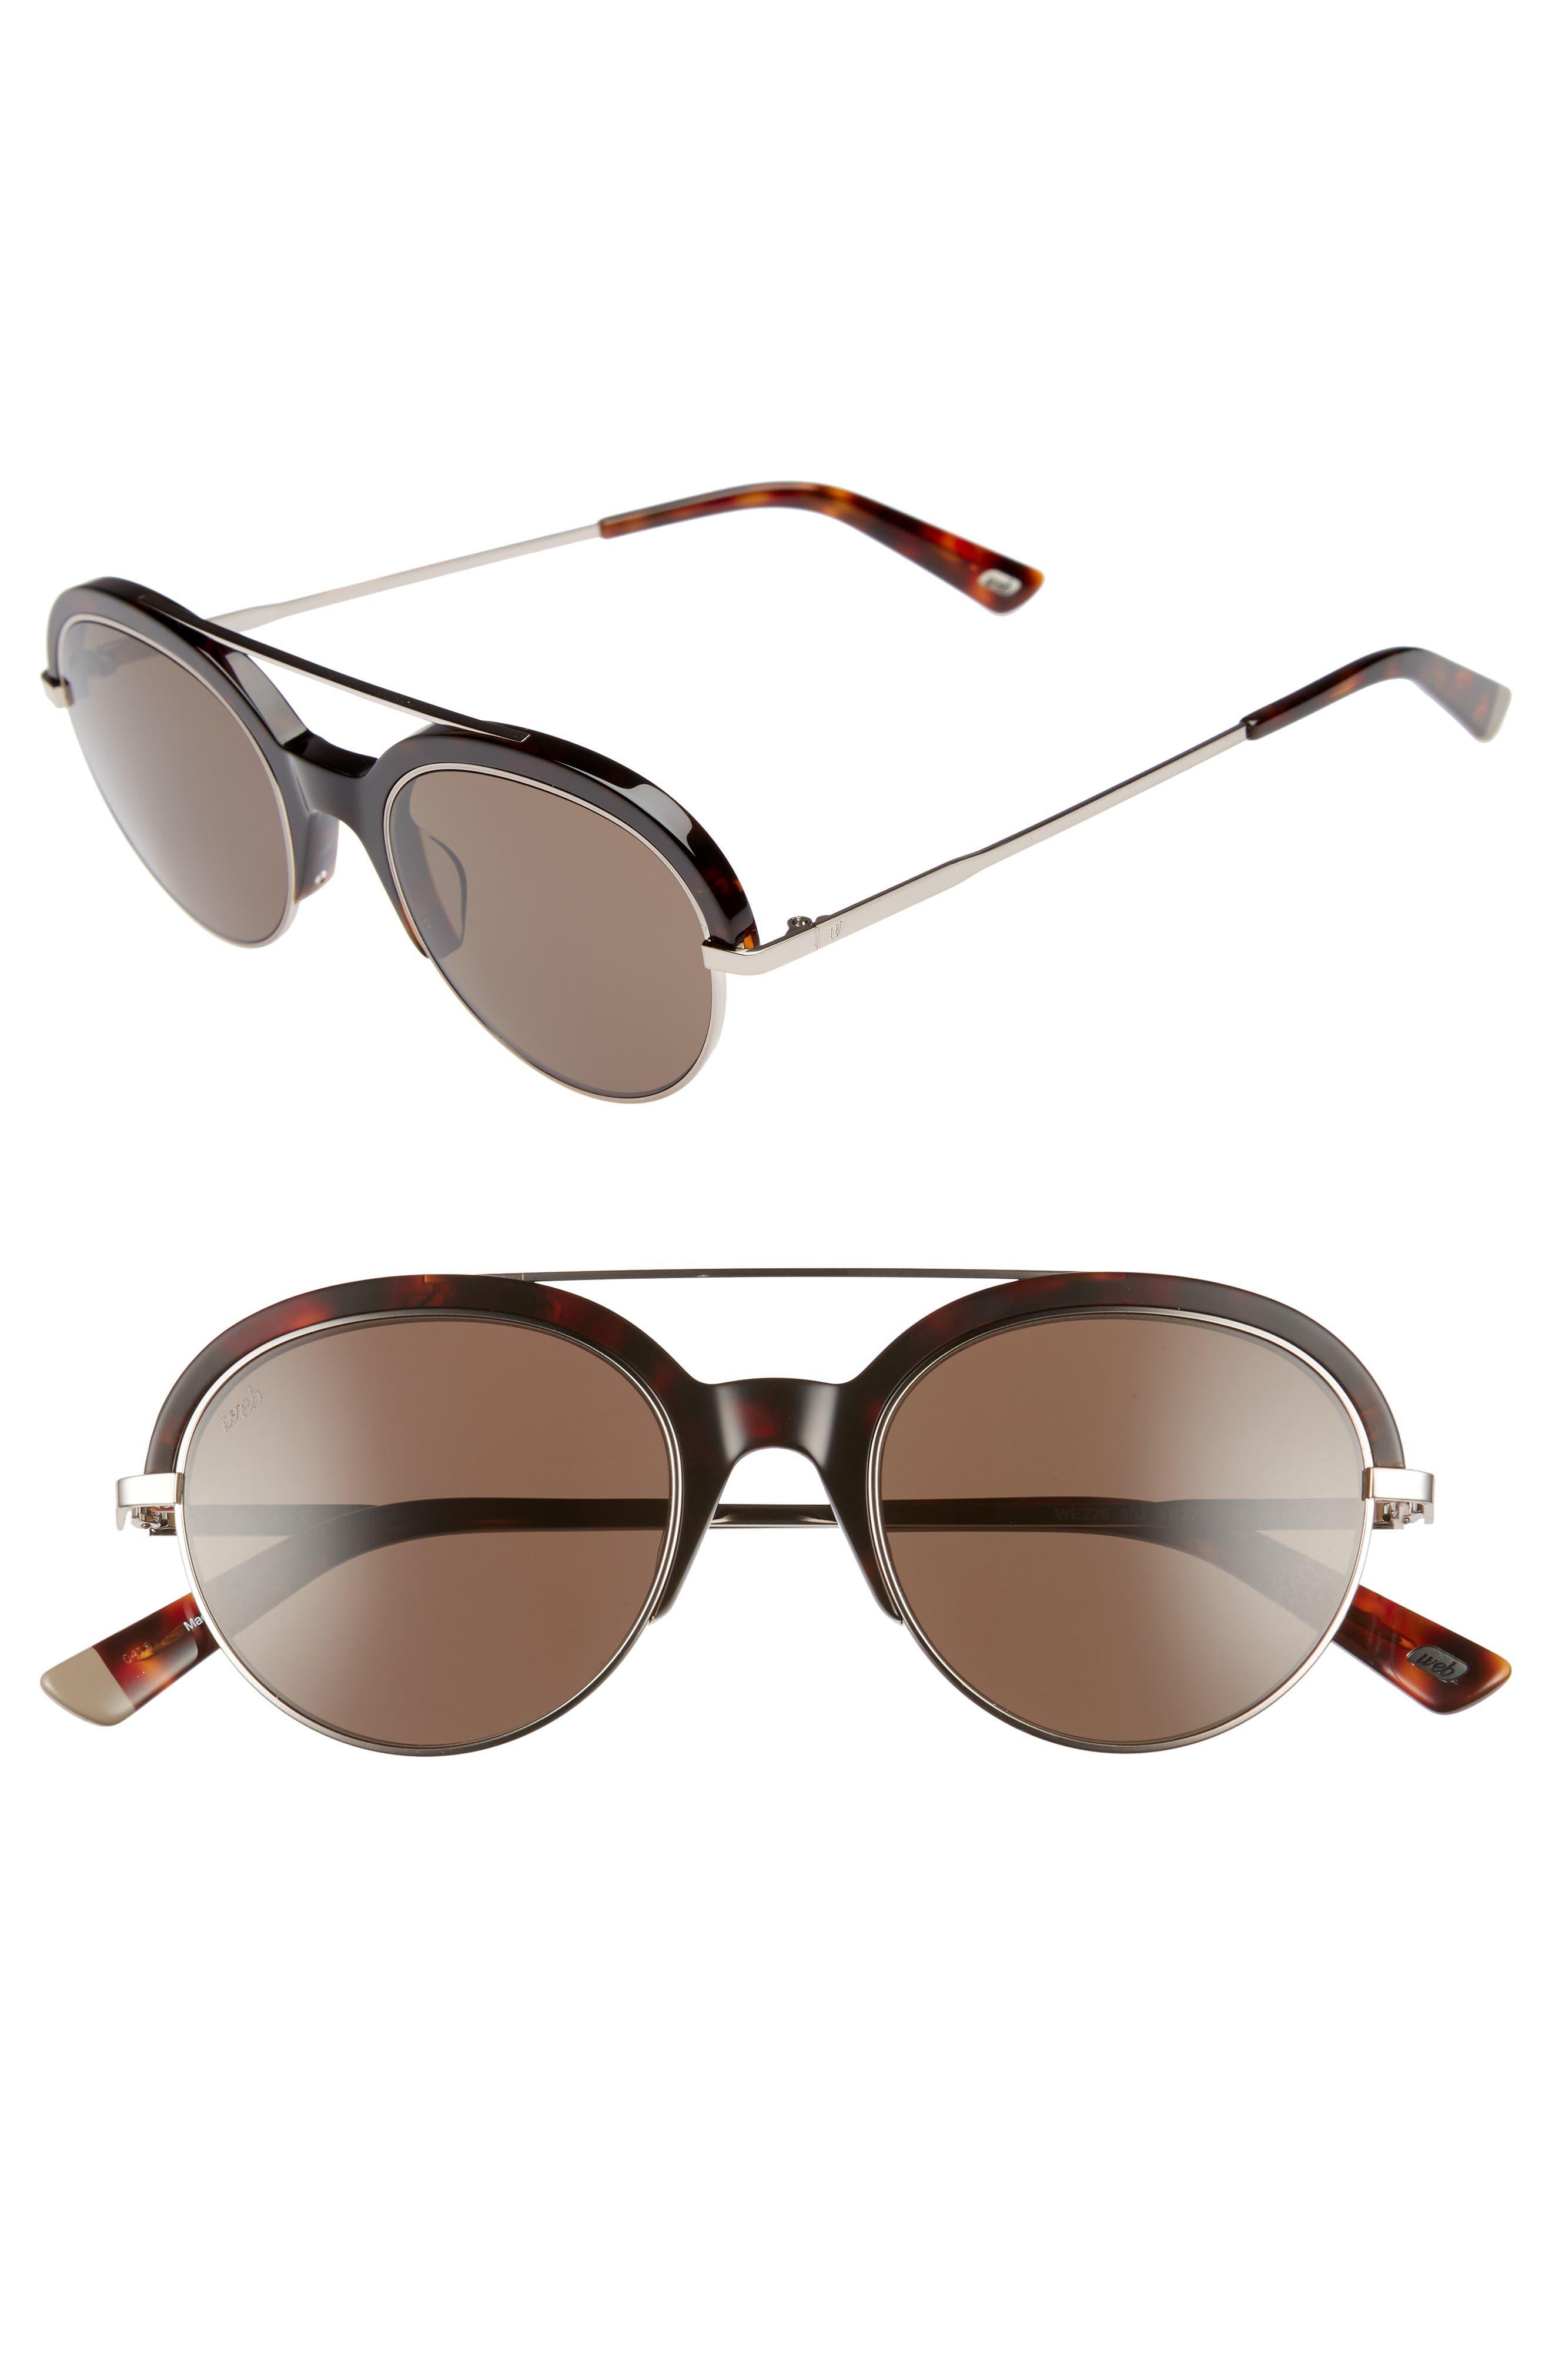 51mm Aviator Sunglasses,                             Main thumbnail 1, color,                             Colored Havana/ Roviex